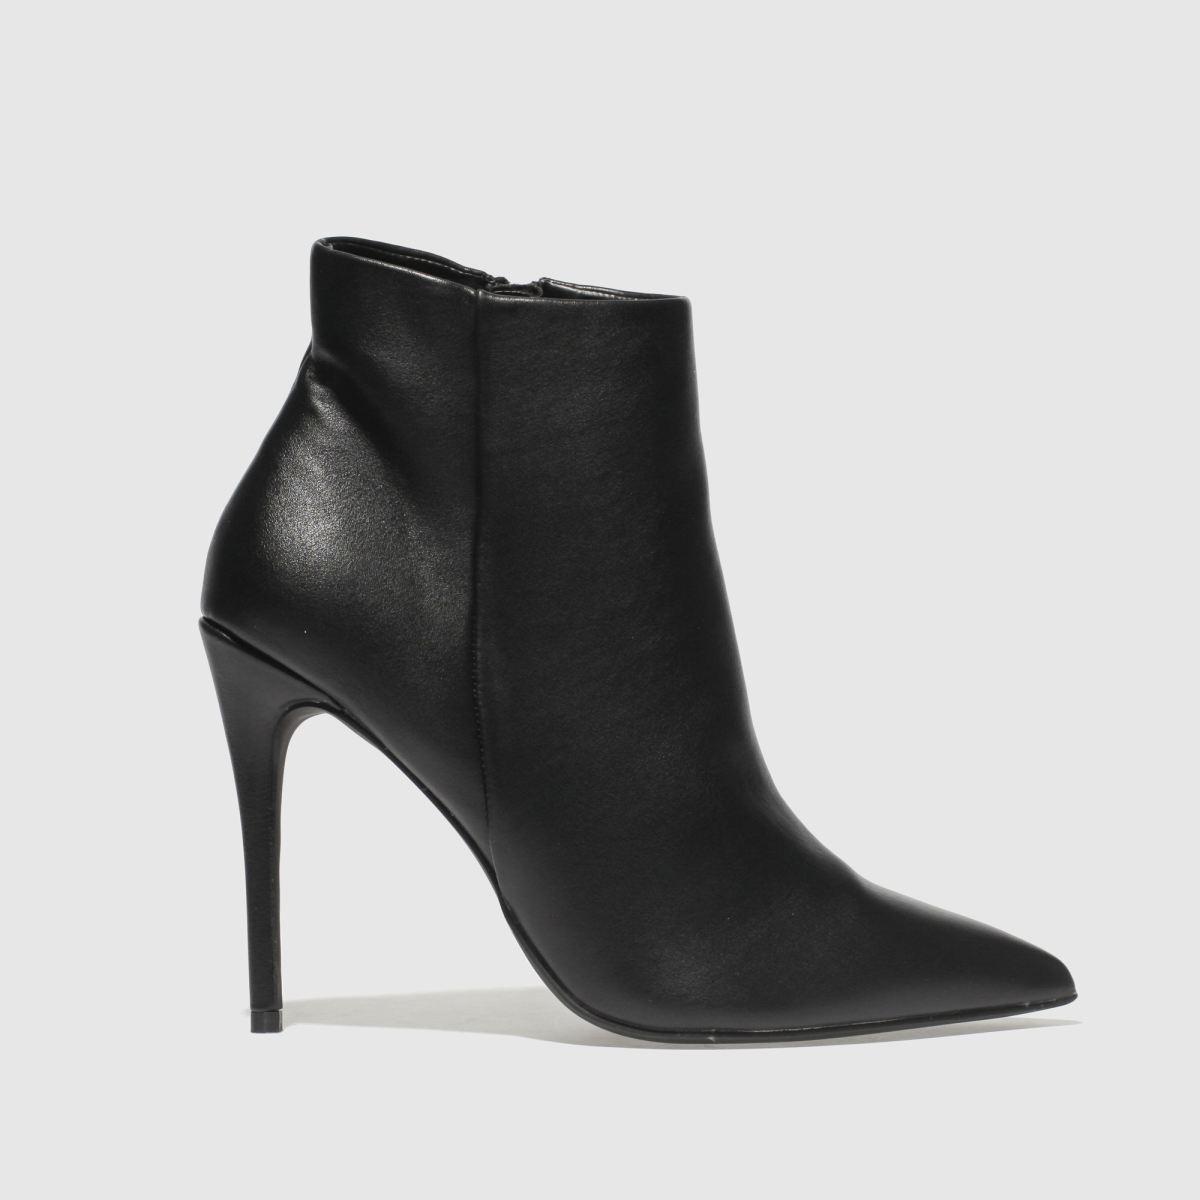 schuh Schuh Black Savage Boots